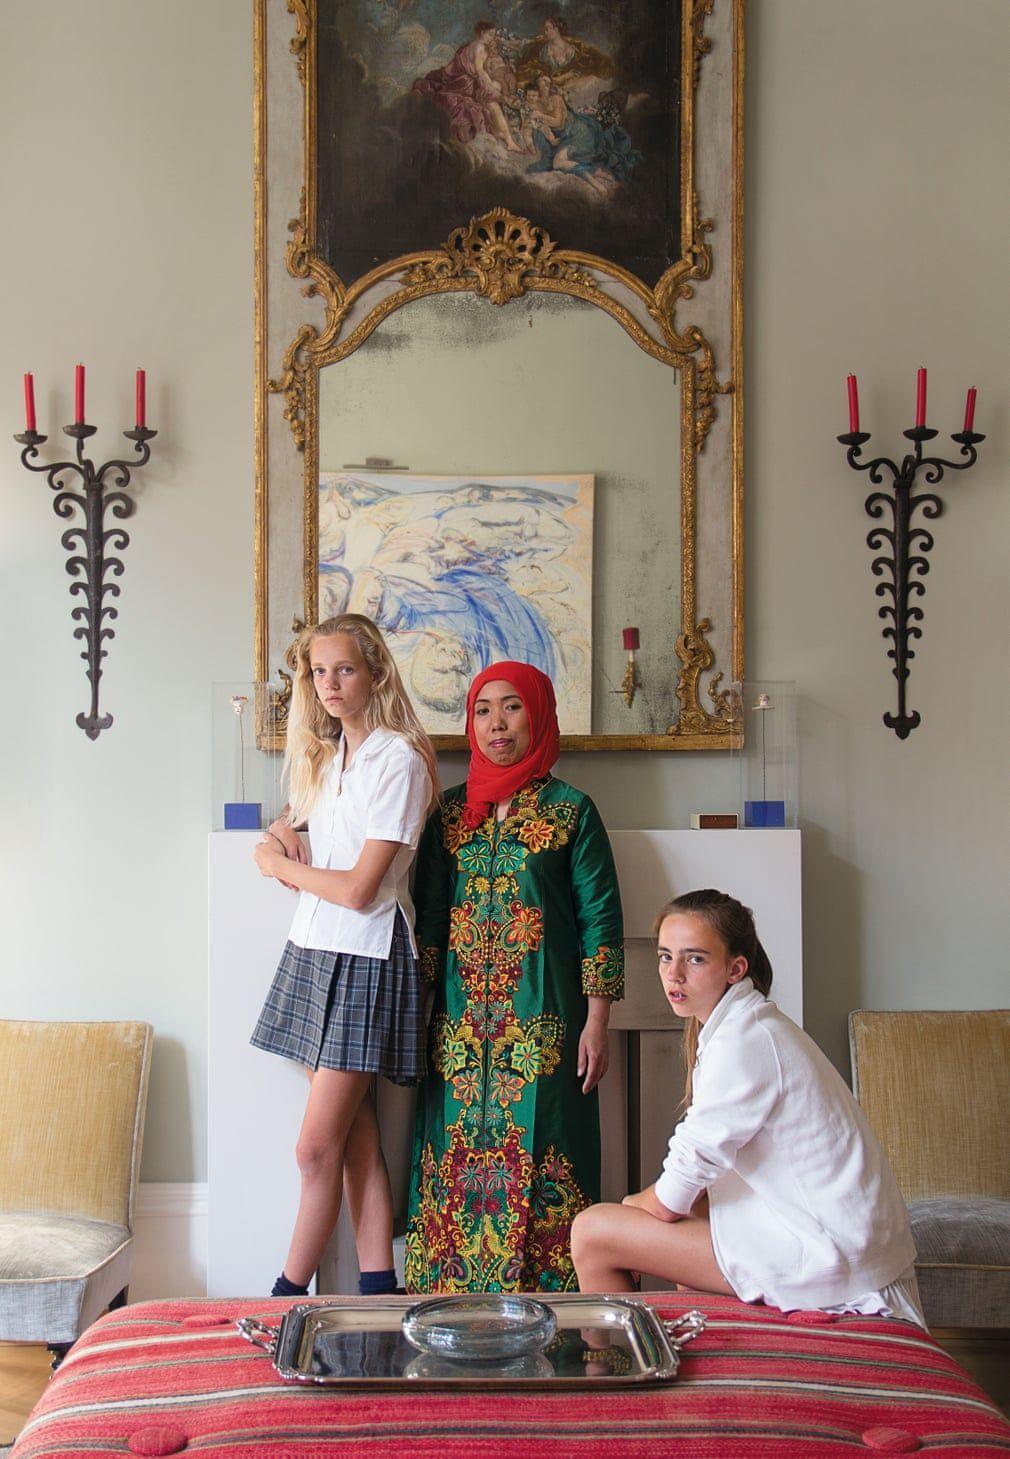 A nanny, a rabbi, a puppy and a parrot portraits of